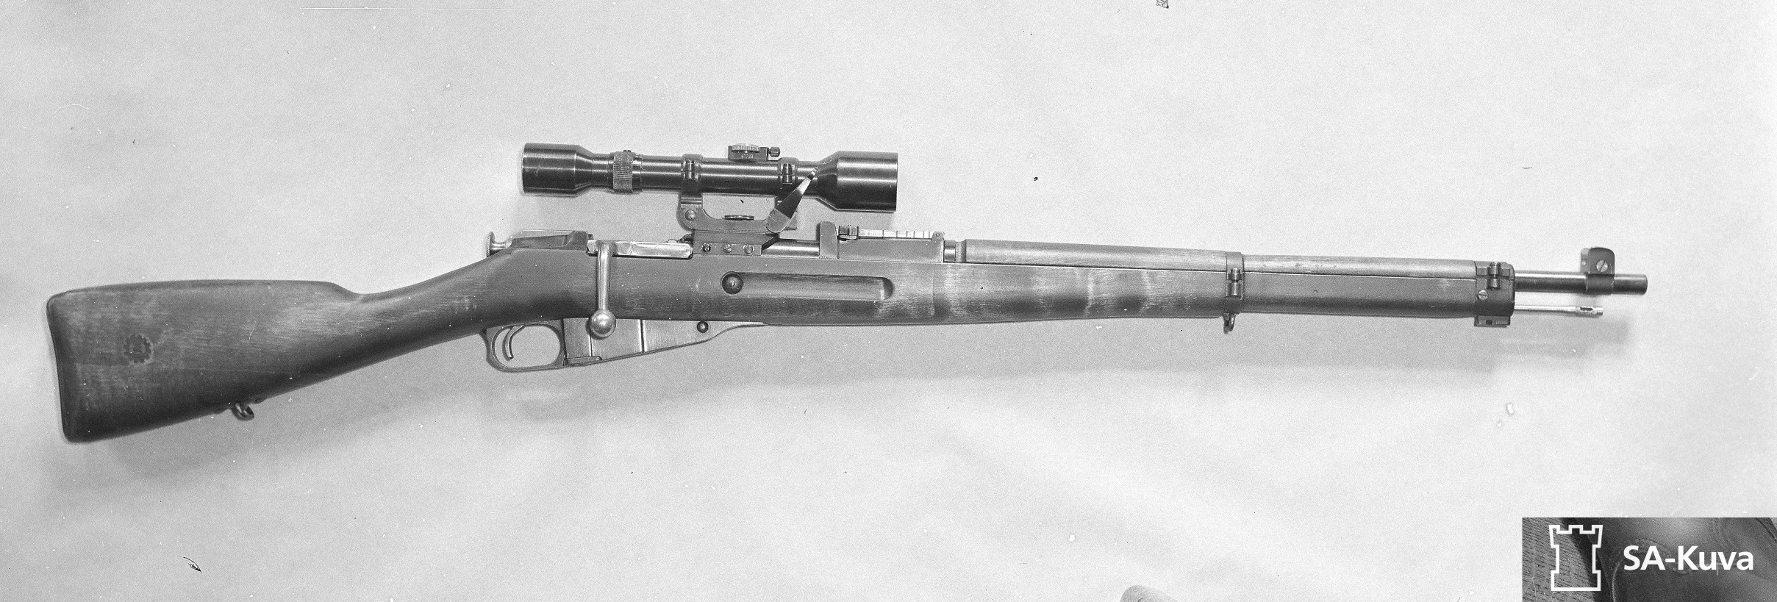 Suomen Armeijan Uudet Aseet